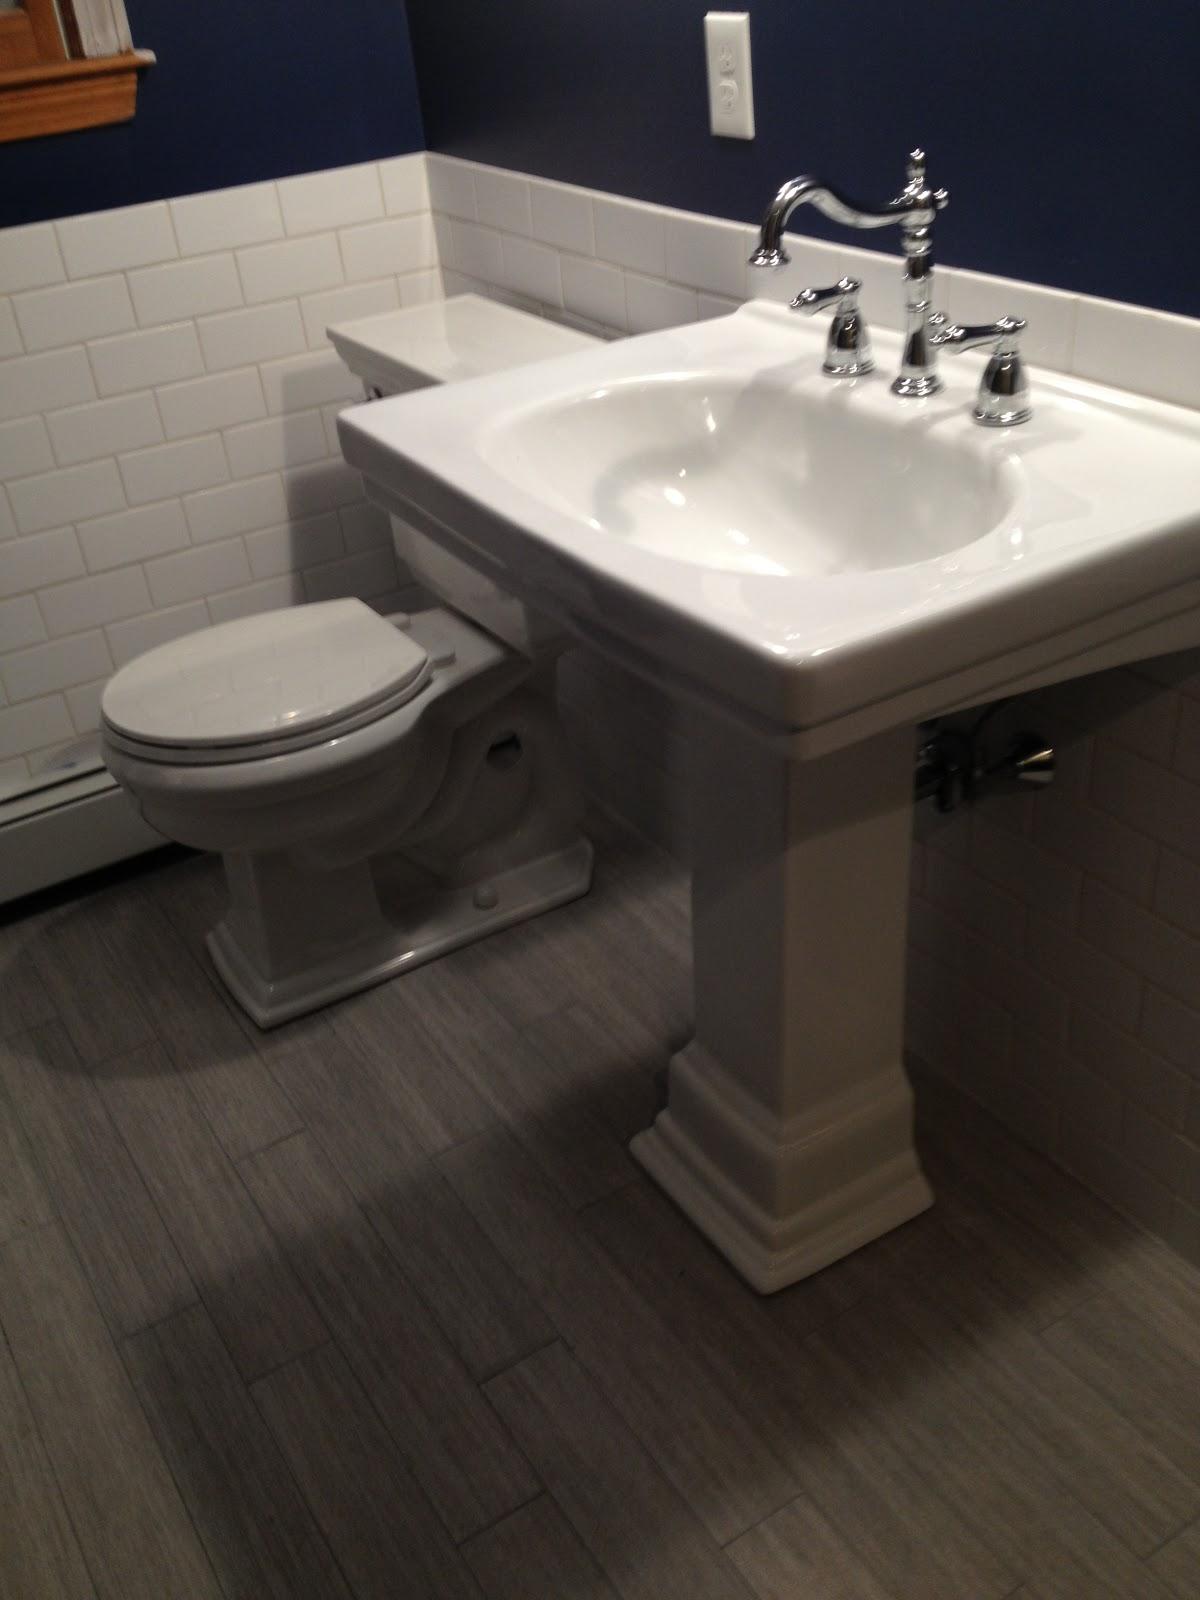 Bathroom Renovation Starting To Look Like A Bathroom Again Notes - Starting a bathroom renovation